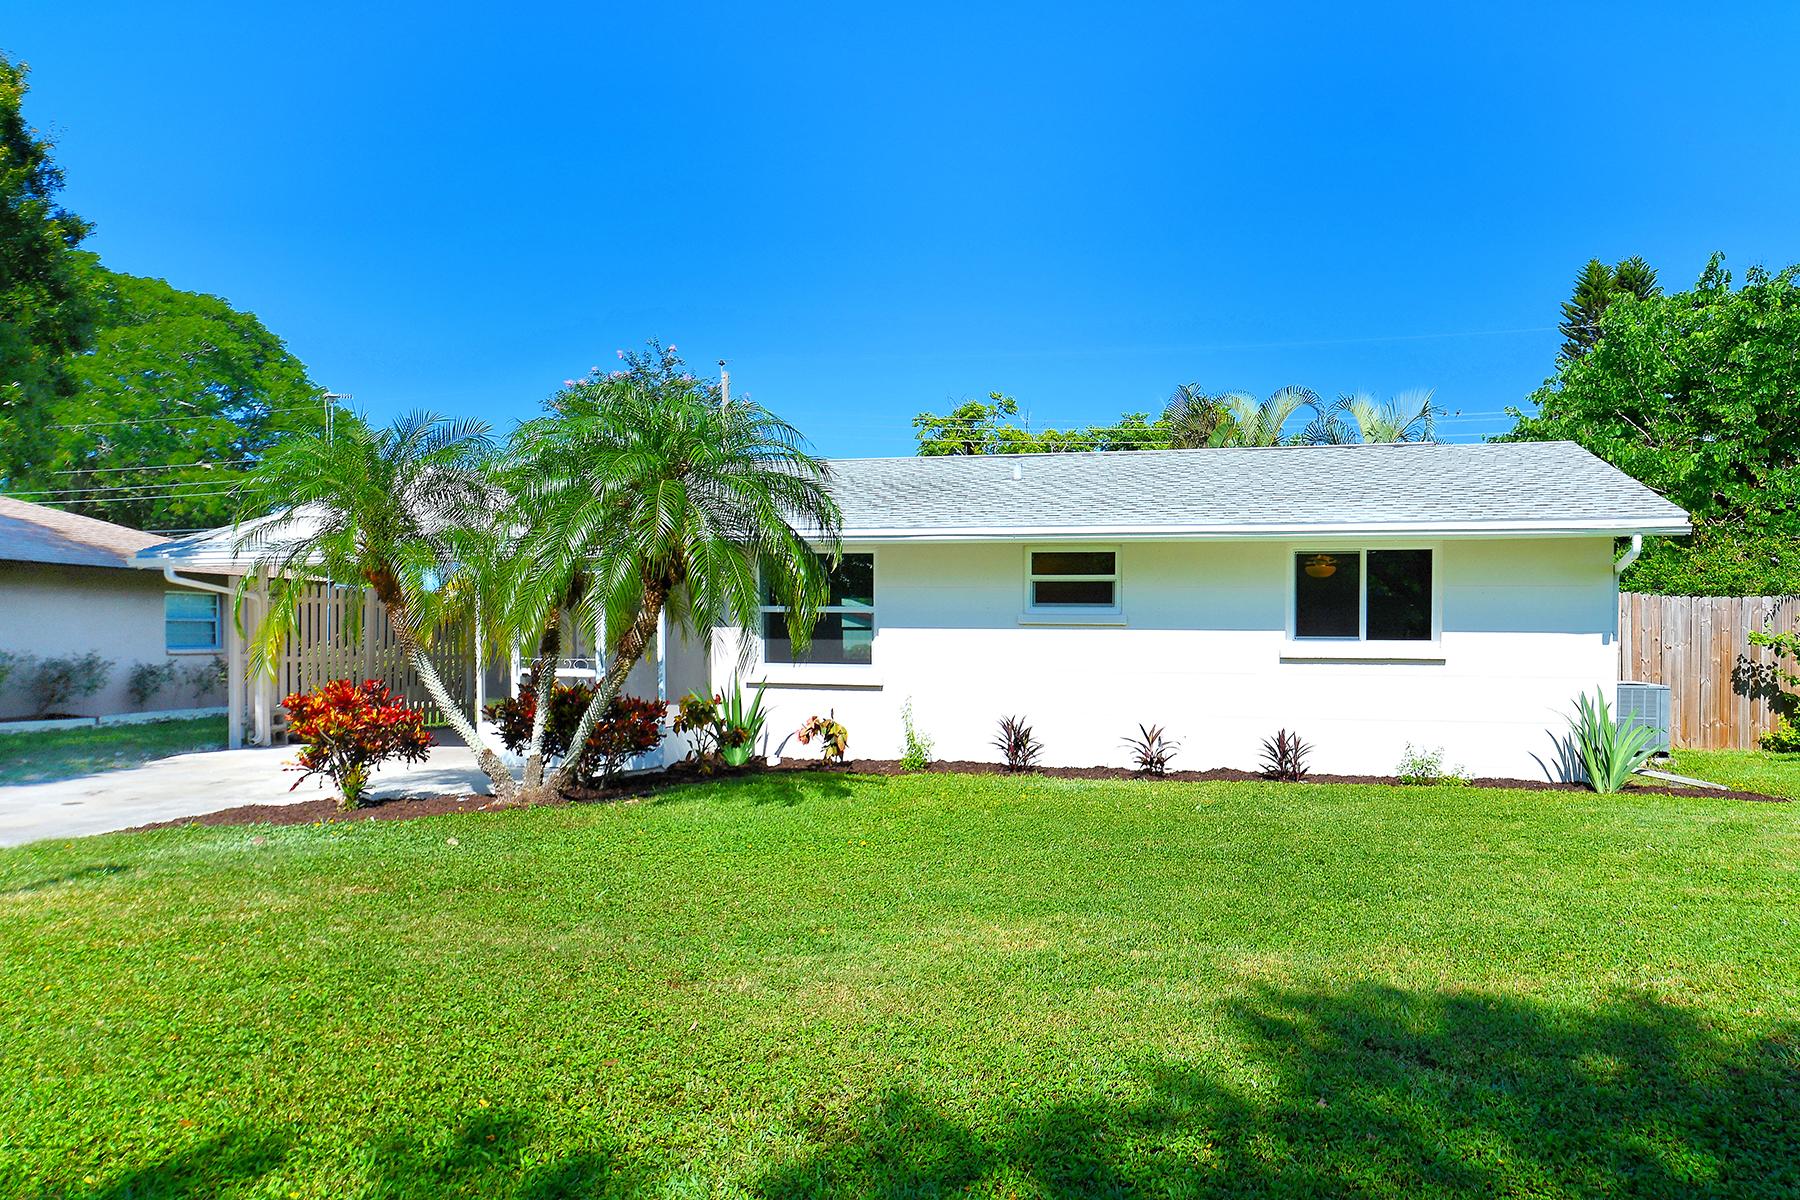 Casa Unifamiliar por un Venta en SUN HAVEN - SARASOTA 5708 Murdock Ave Sarasota, Florida, 34231 Estados Unidos